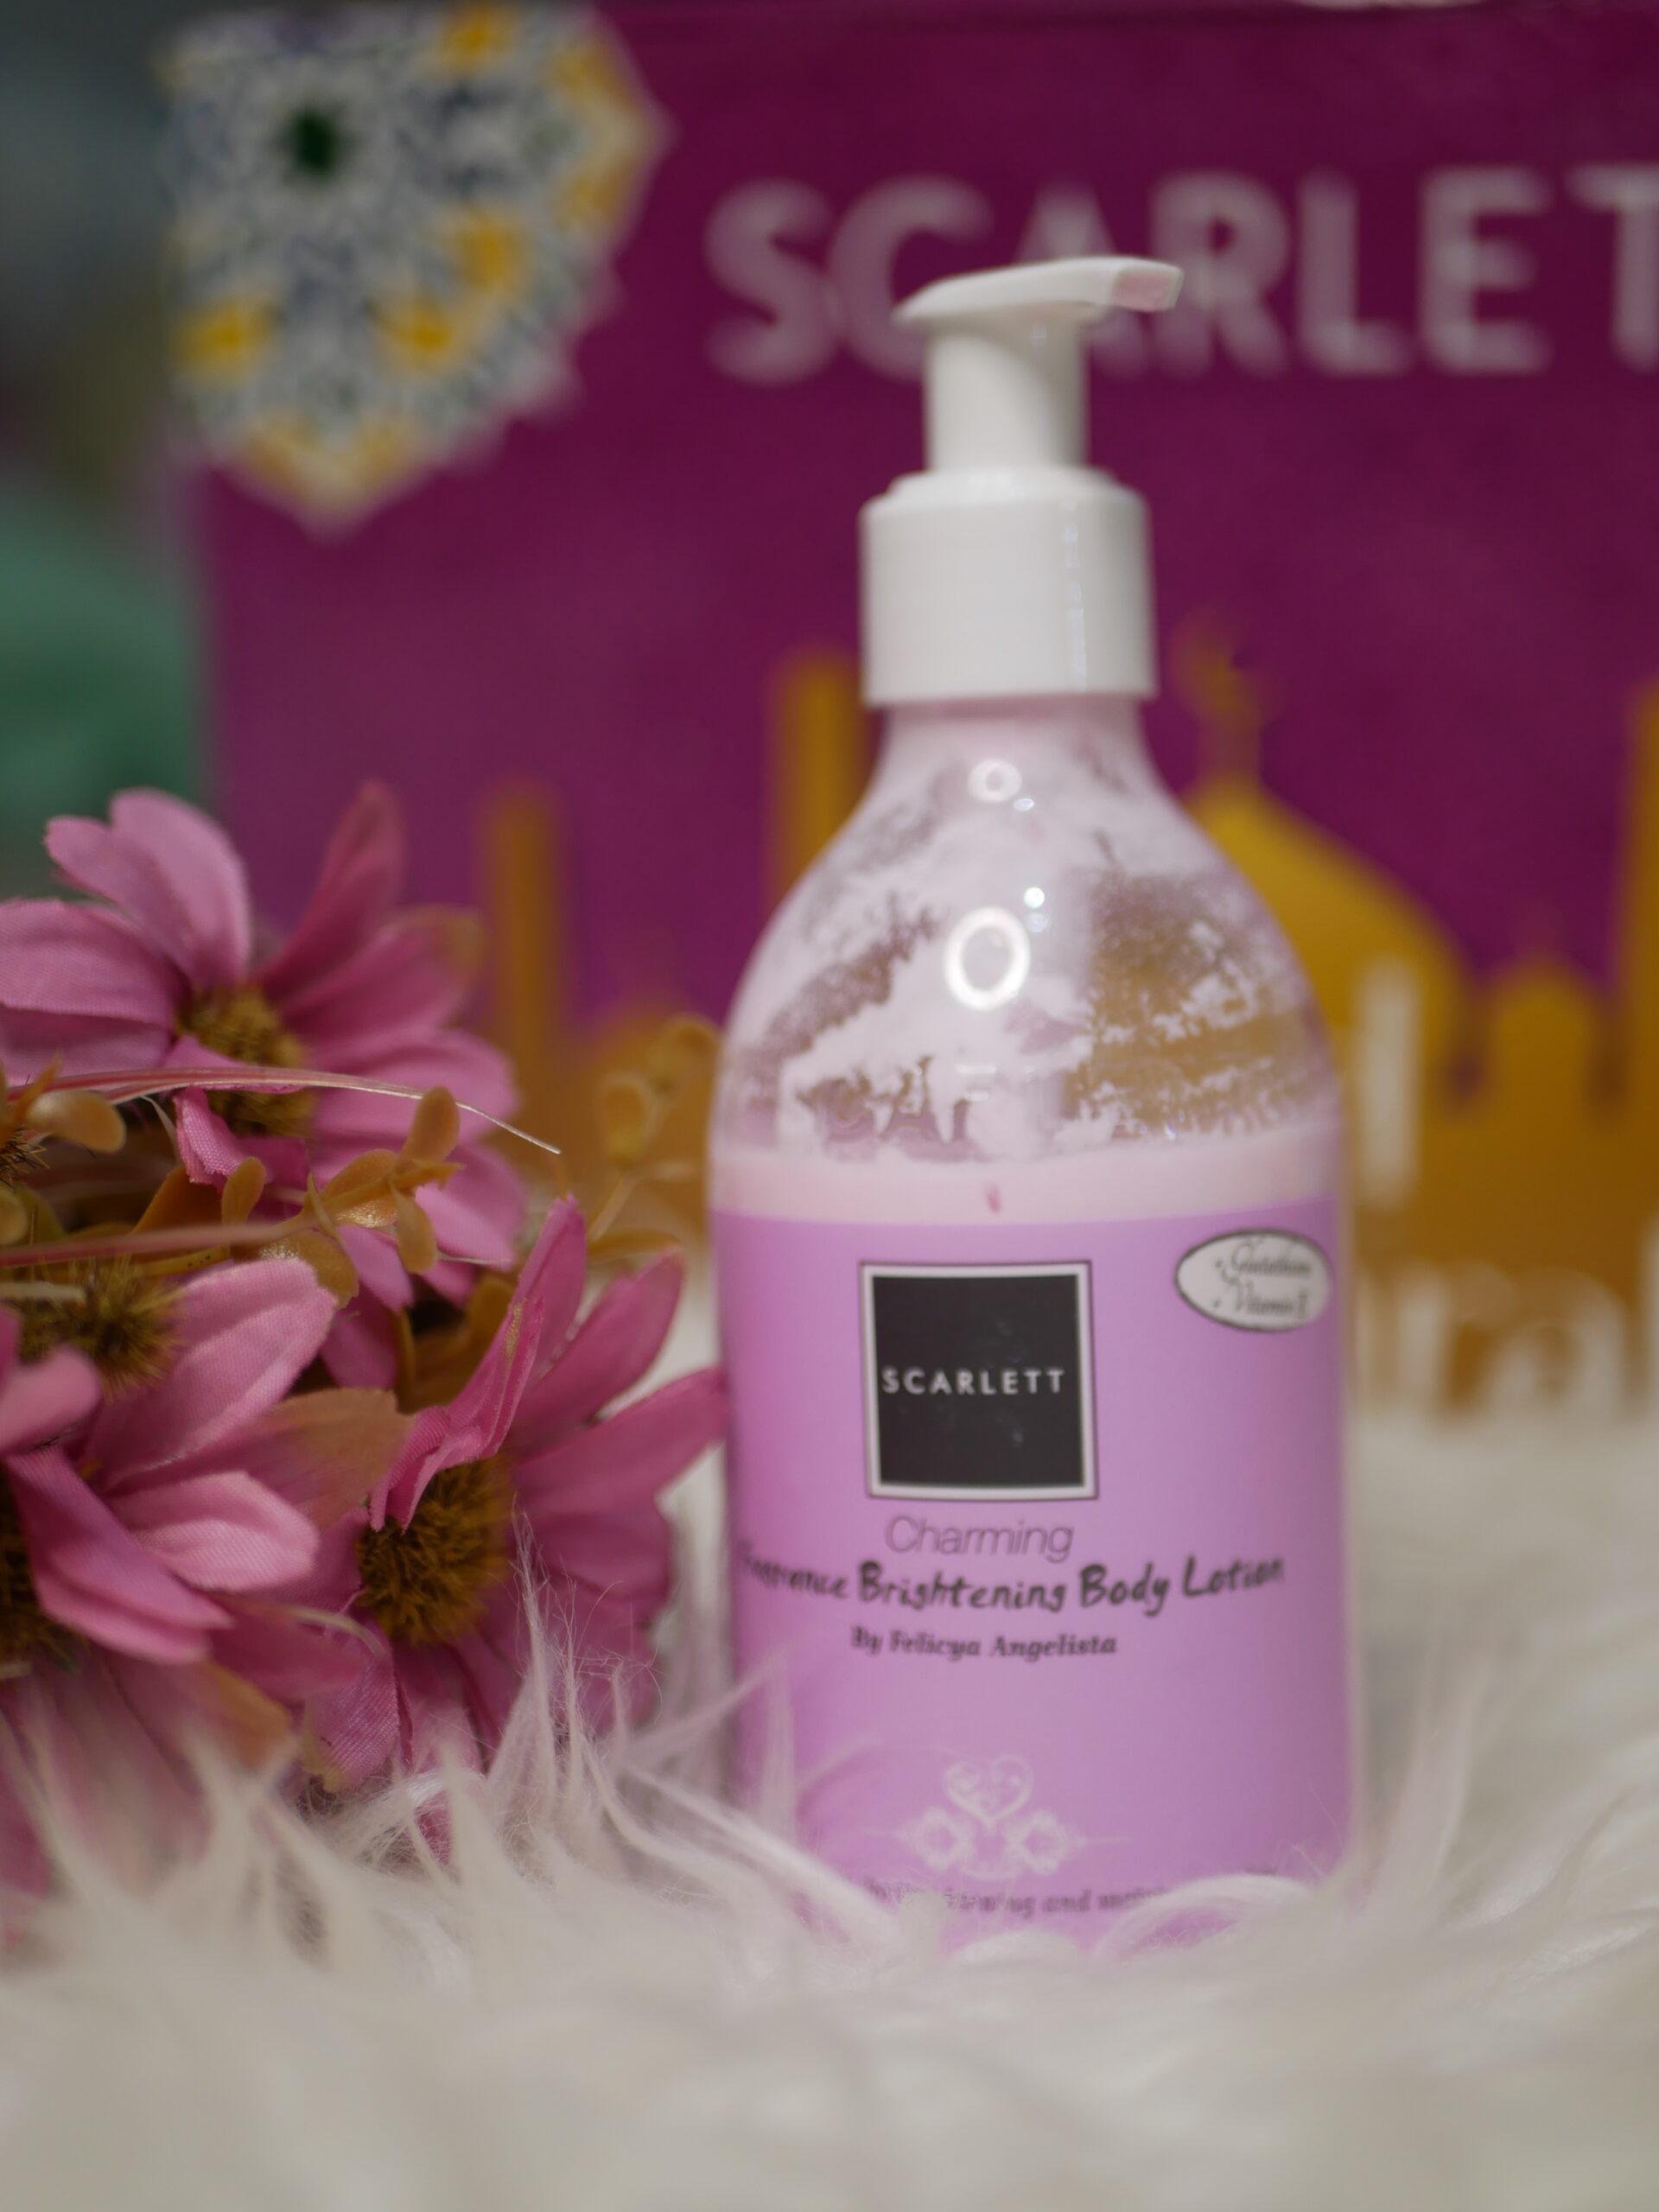 Scarlett Fragrance Brigthening Body Lotion (Charming)